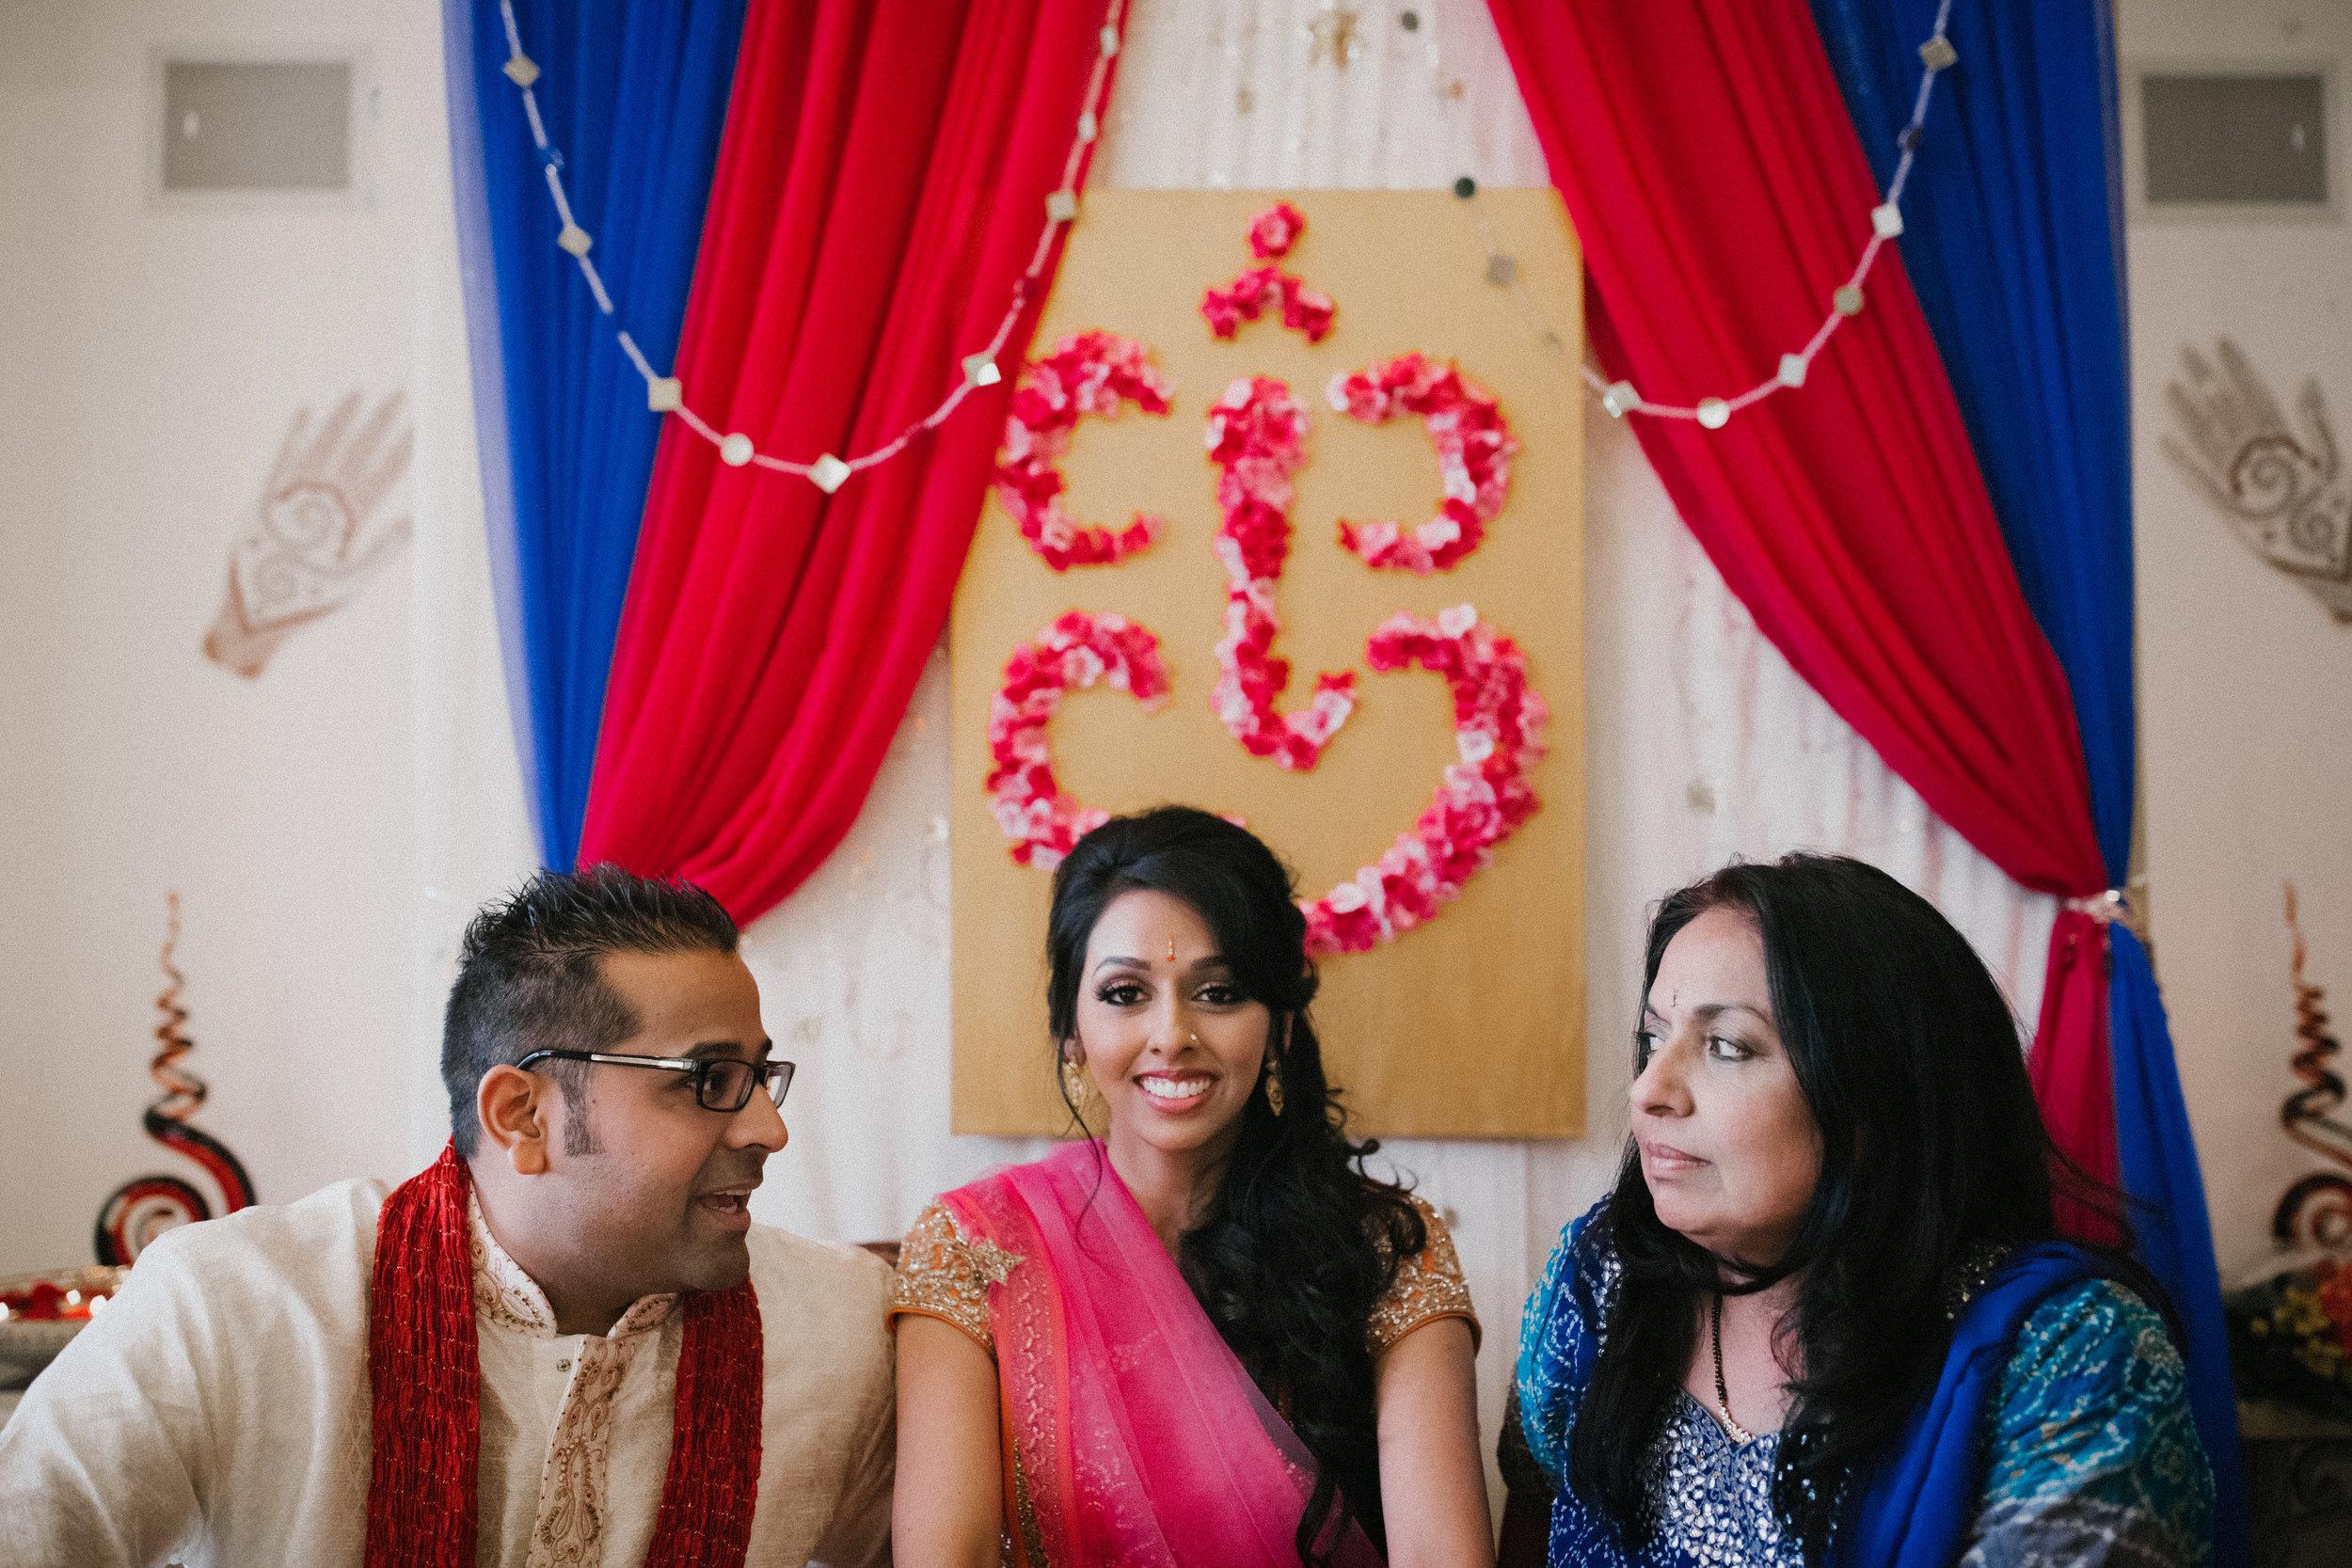 Aparna-Ankit-Patel-Mehndi-Wedding-Photos-0064.jpg